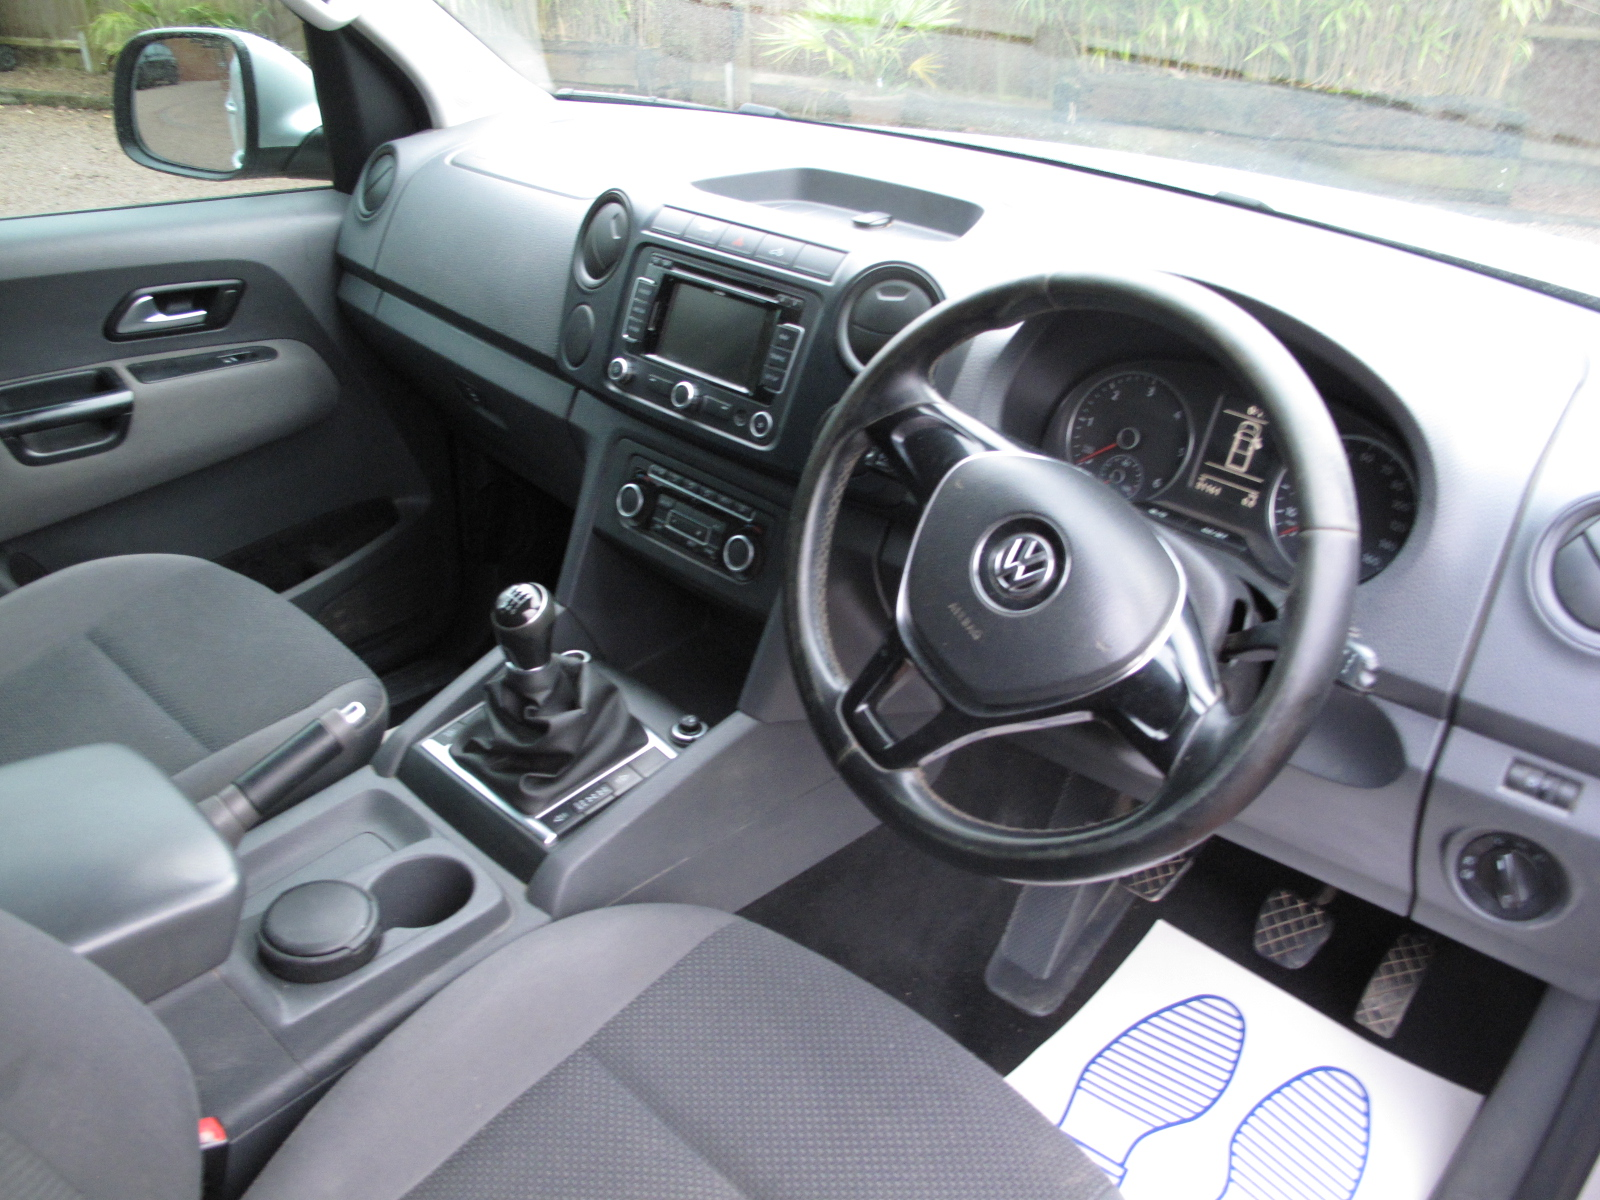 2016 65 Volkswagen Amarok 2.0 TDI Trendline Sel Pickup 4MOTION ABSOLUTELY PRISTINE CONDITION! NO VAT! SOLD! full